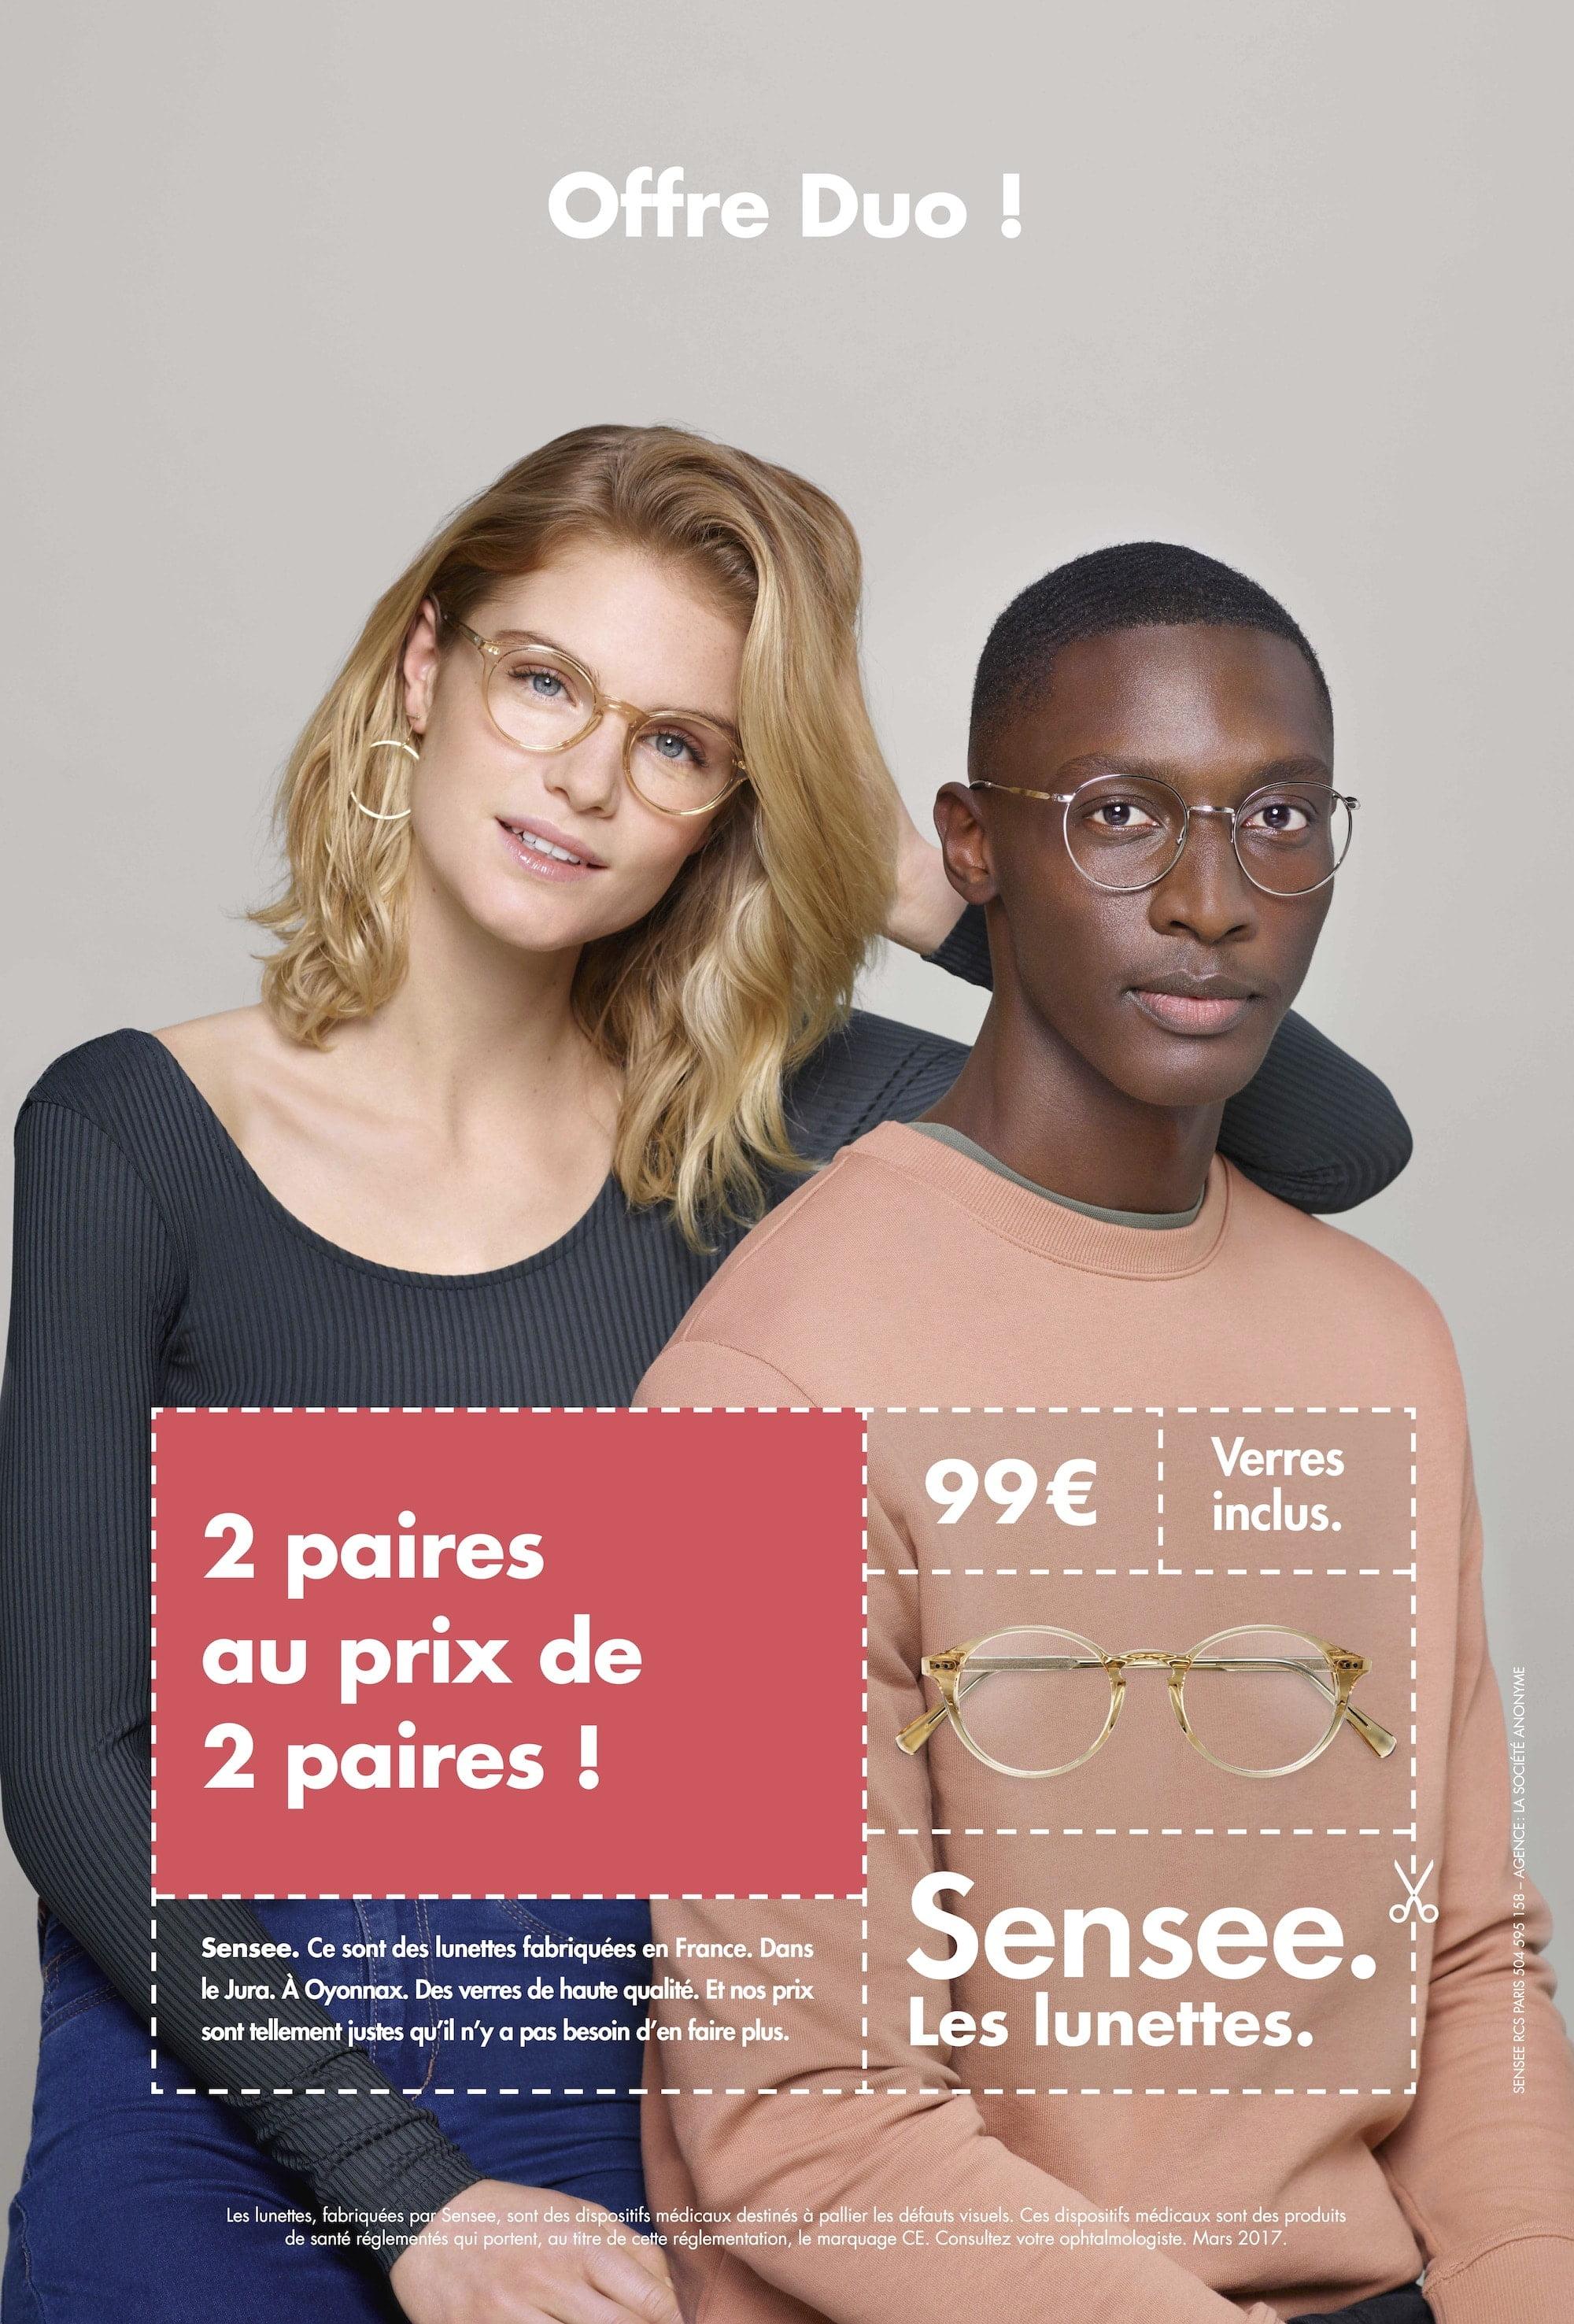 https://www.marques-de-france.fr/wp-content/uploads/2019/04/Sensee_pub-2.jpg